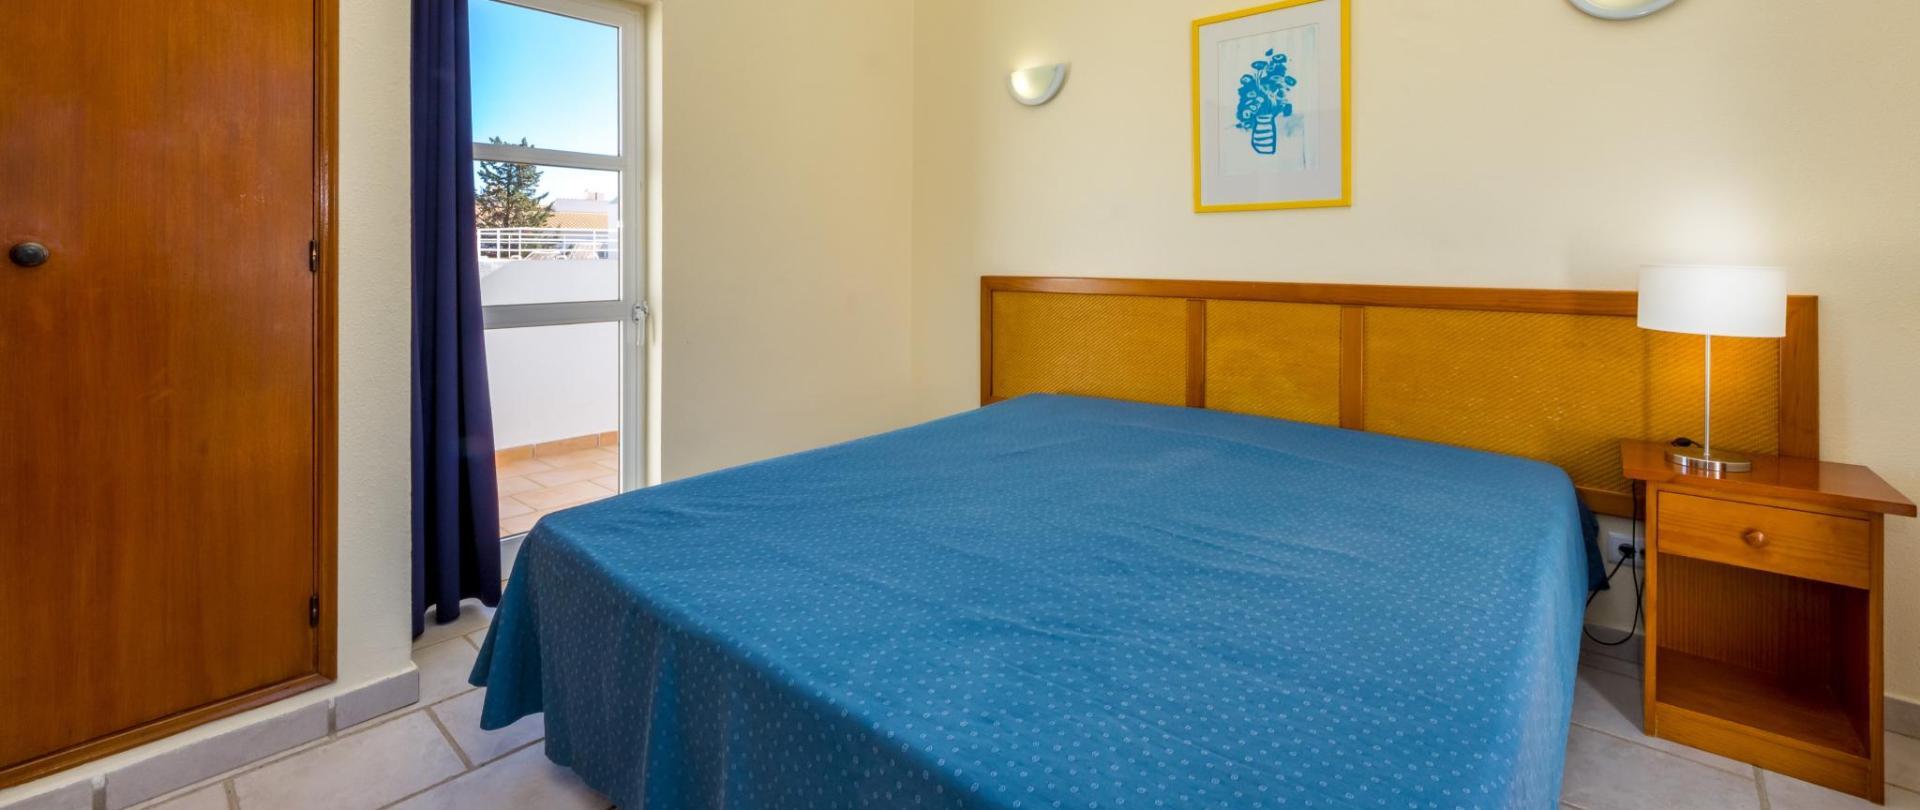 Ouratlantico - Apartamento T1 Duplex-10.jpg